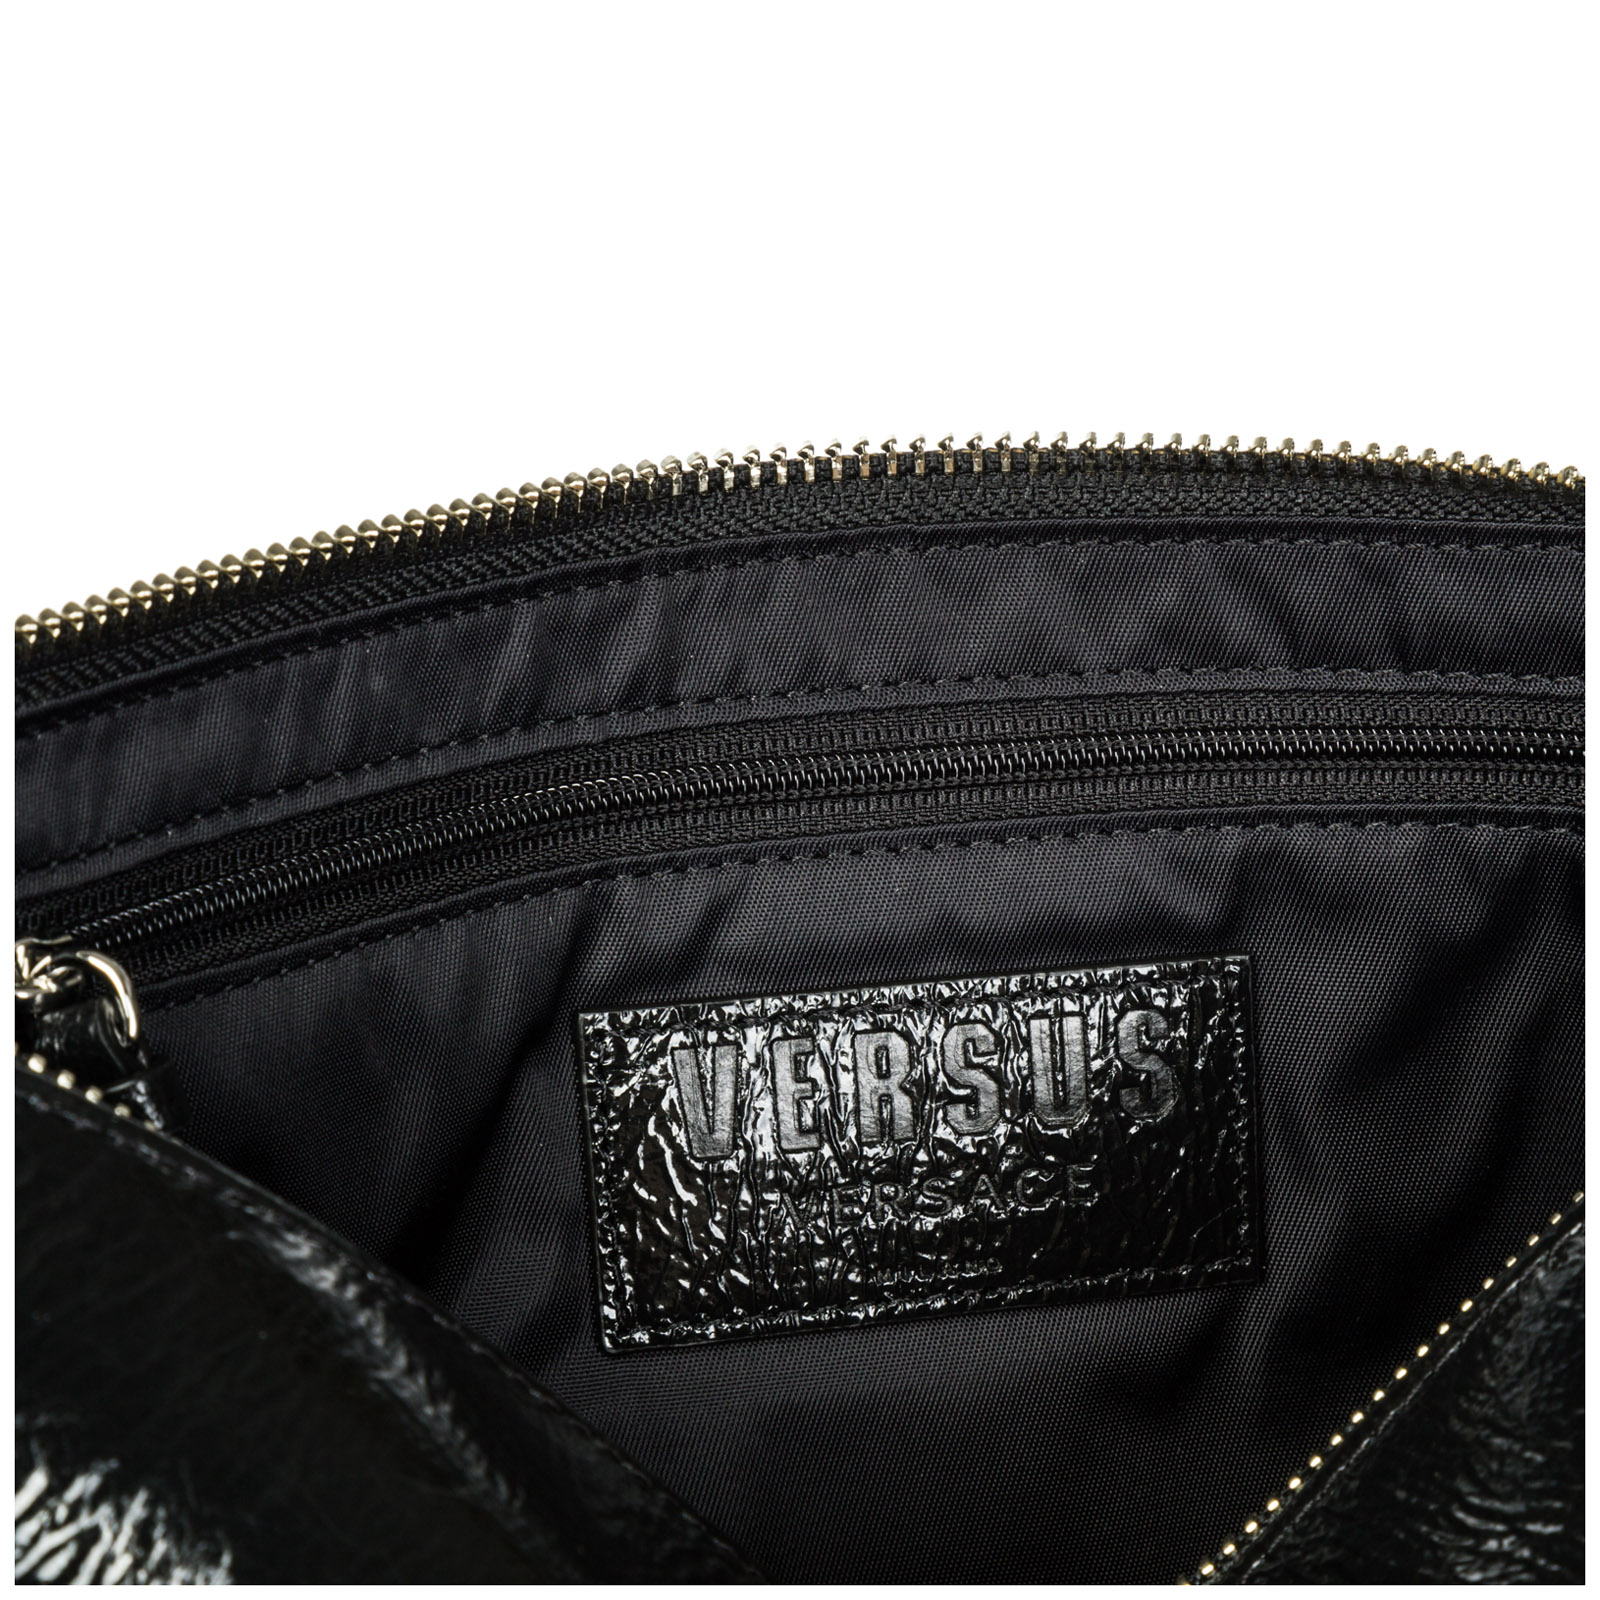 Women's leather clutch handbag bag purse